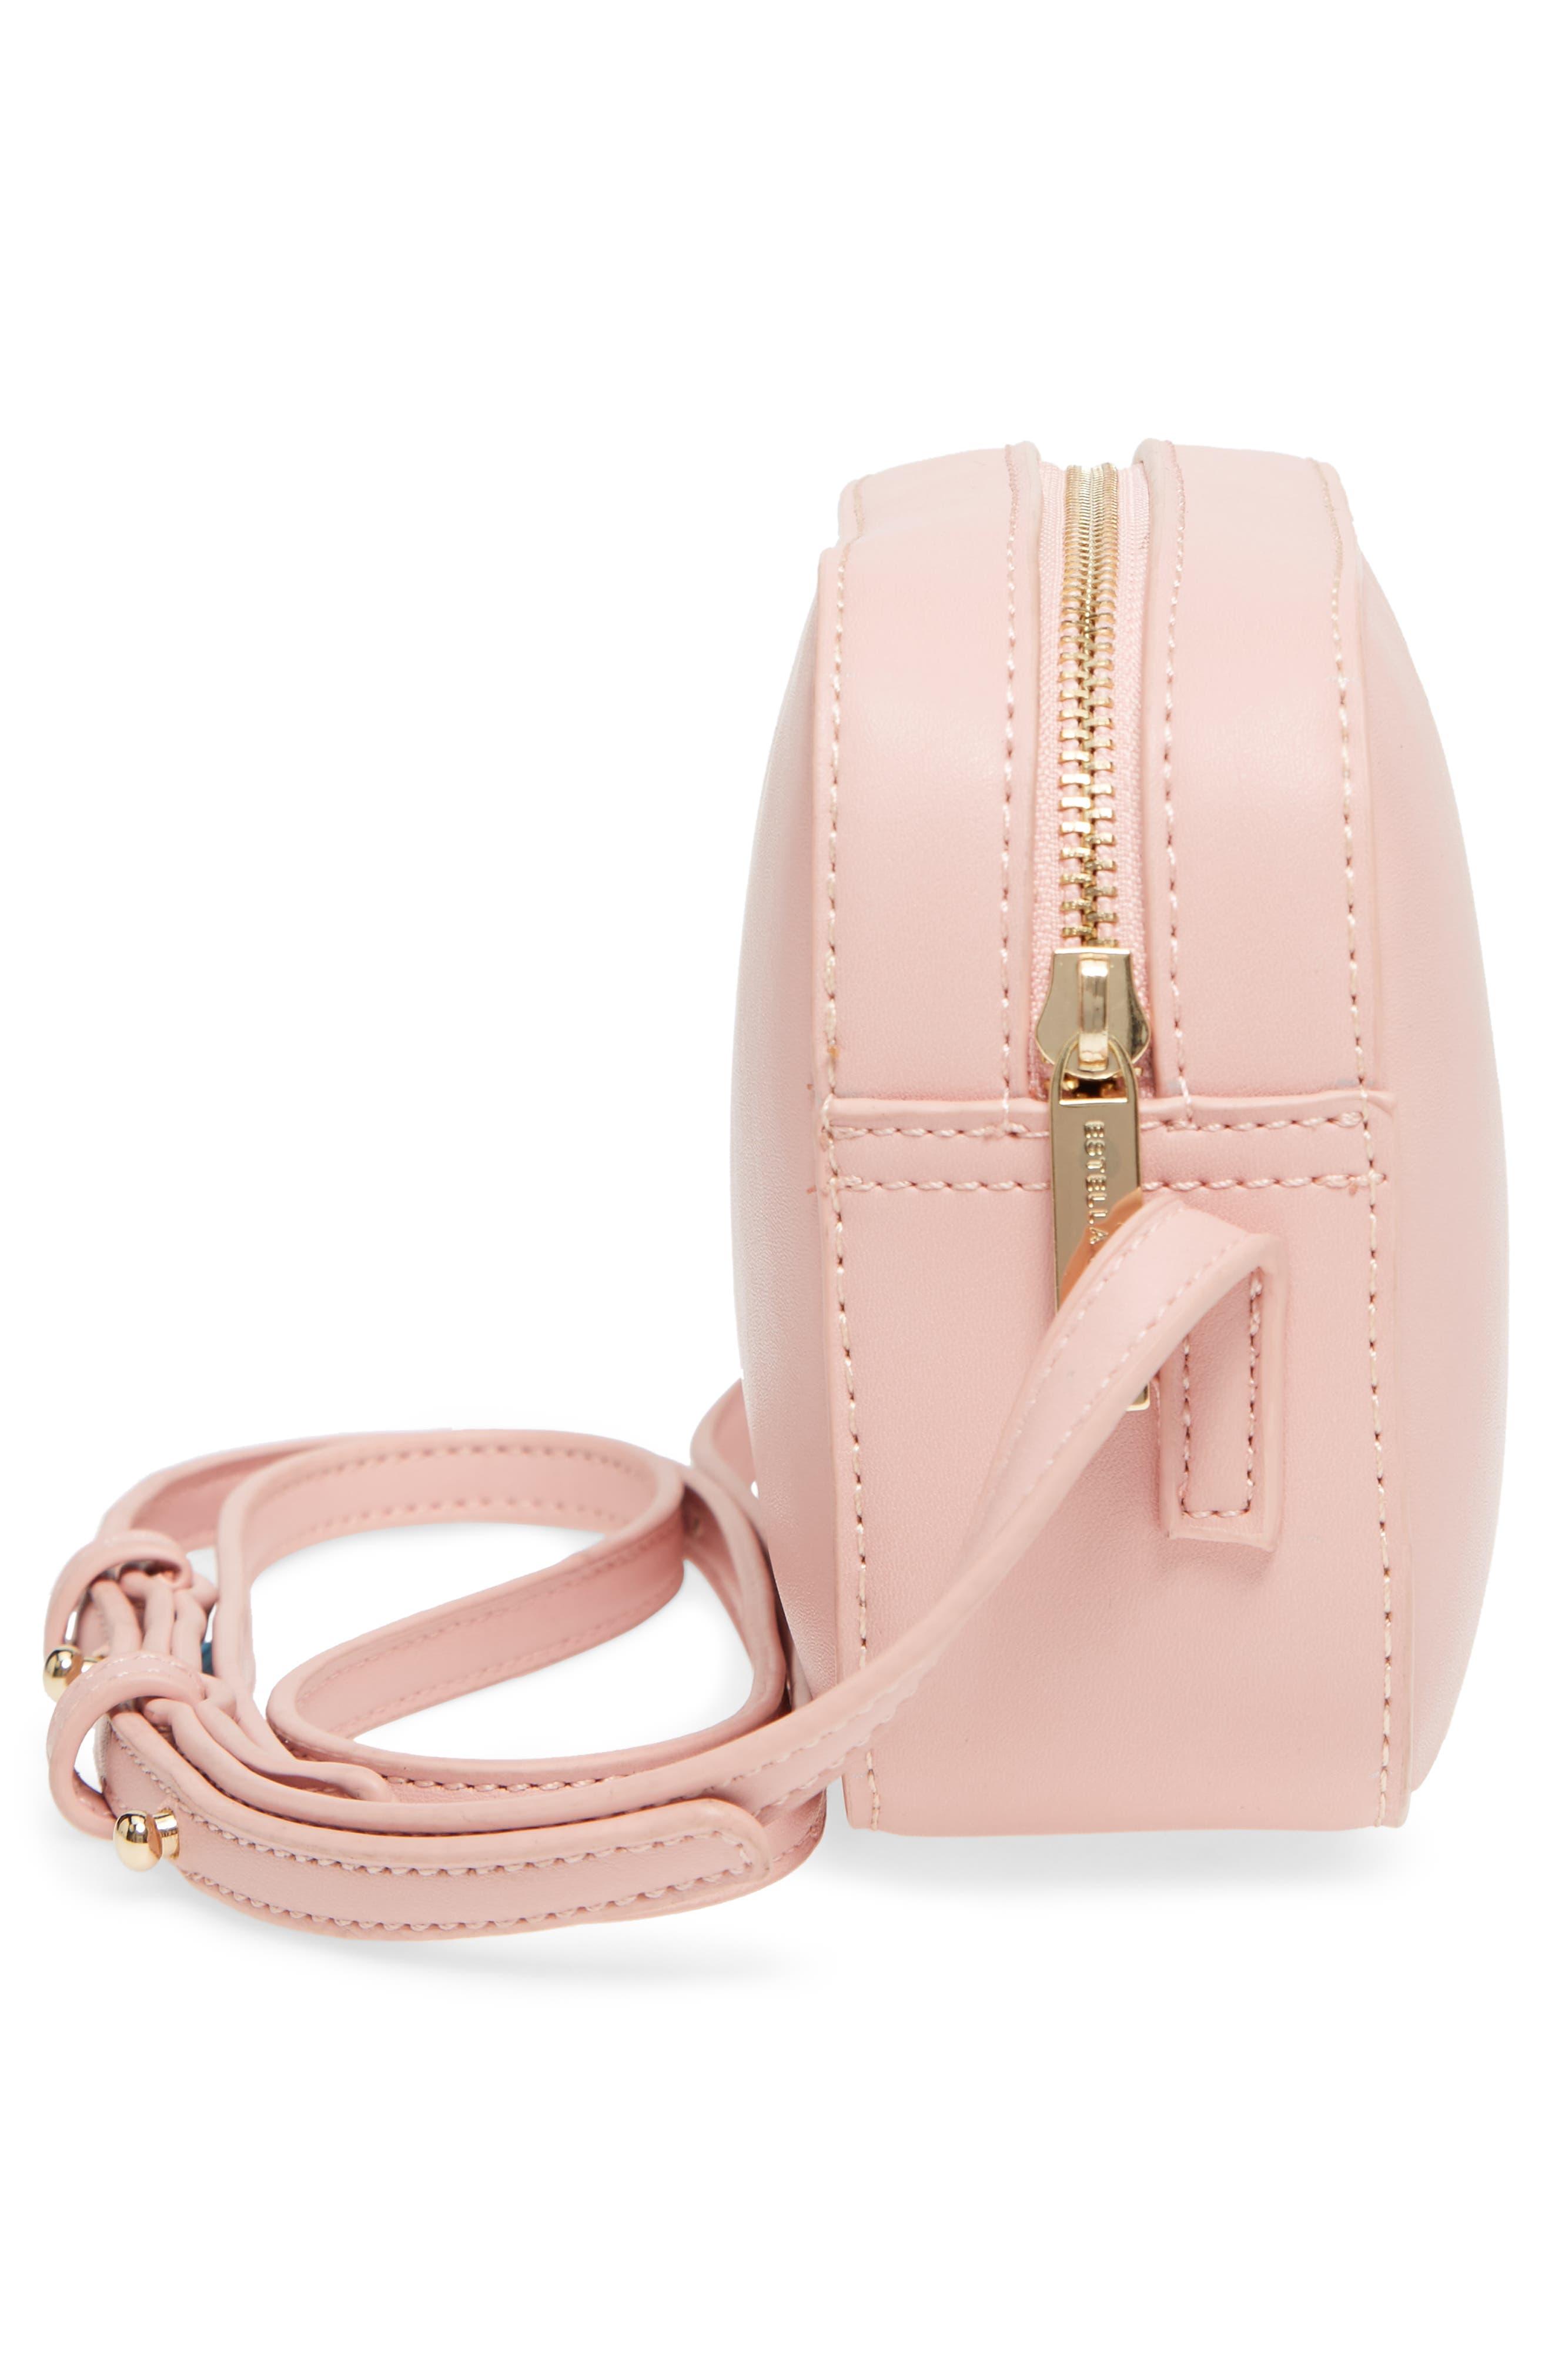 Faux Leather Box Bag,                             Alternate thumbnail 5, color,                             Pink